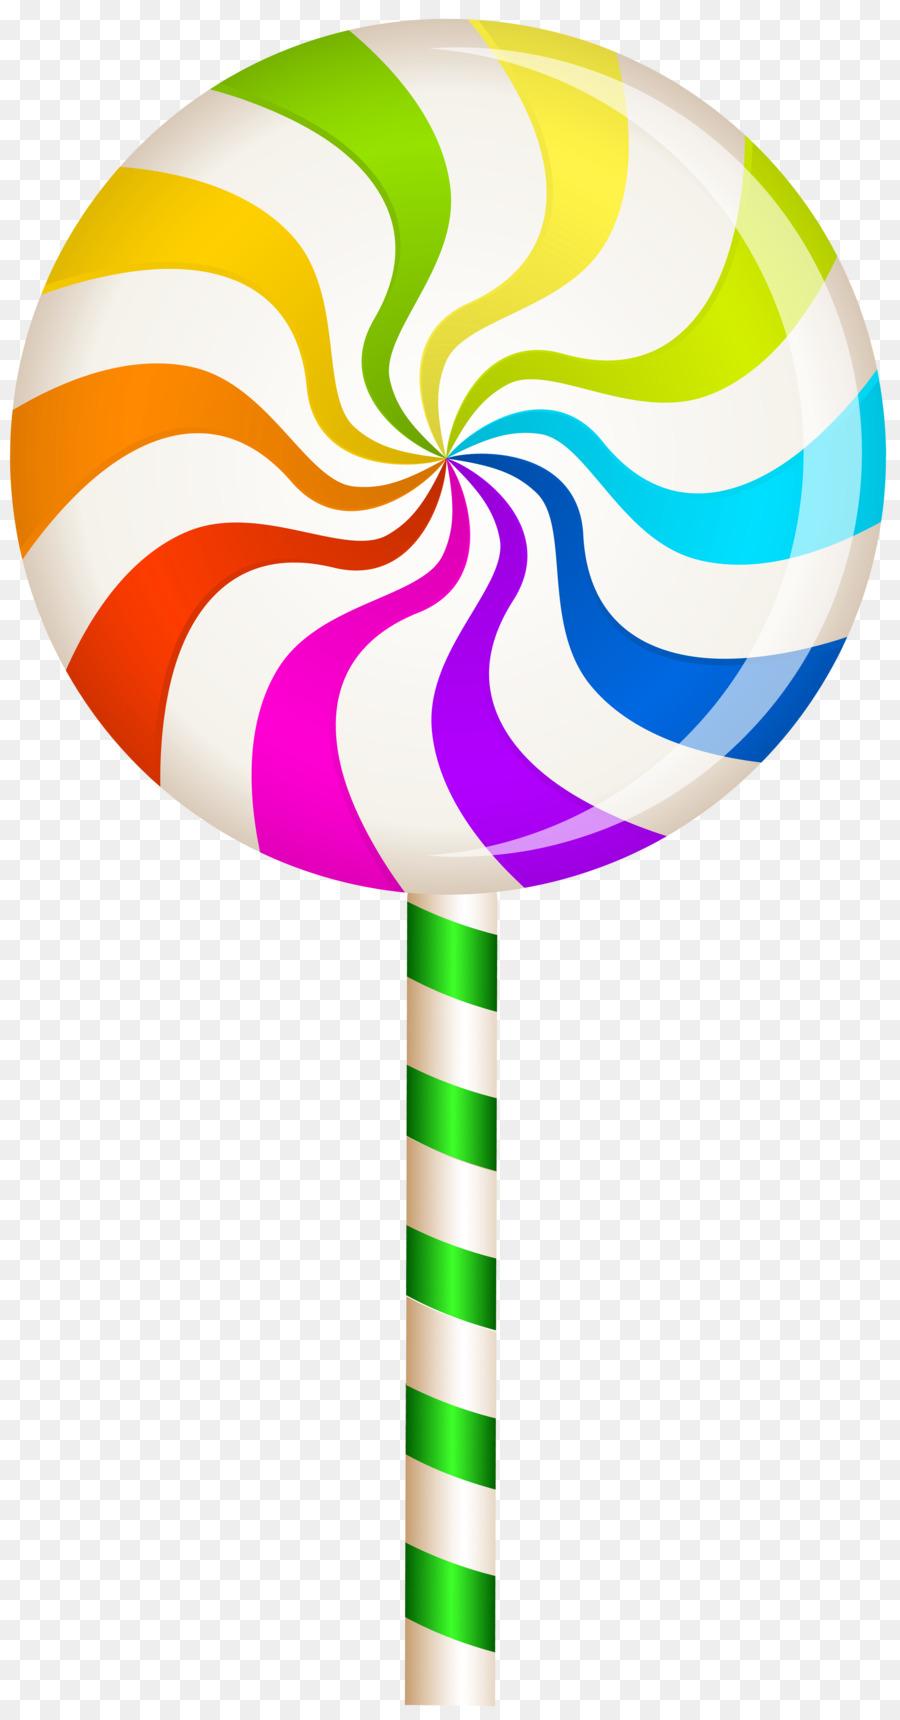 Lollipop clipart circle. Background illustration line